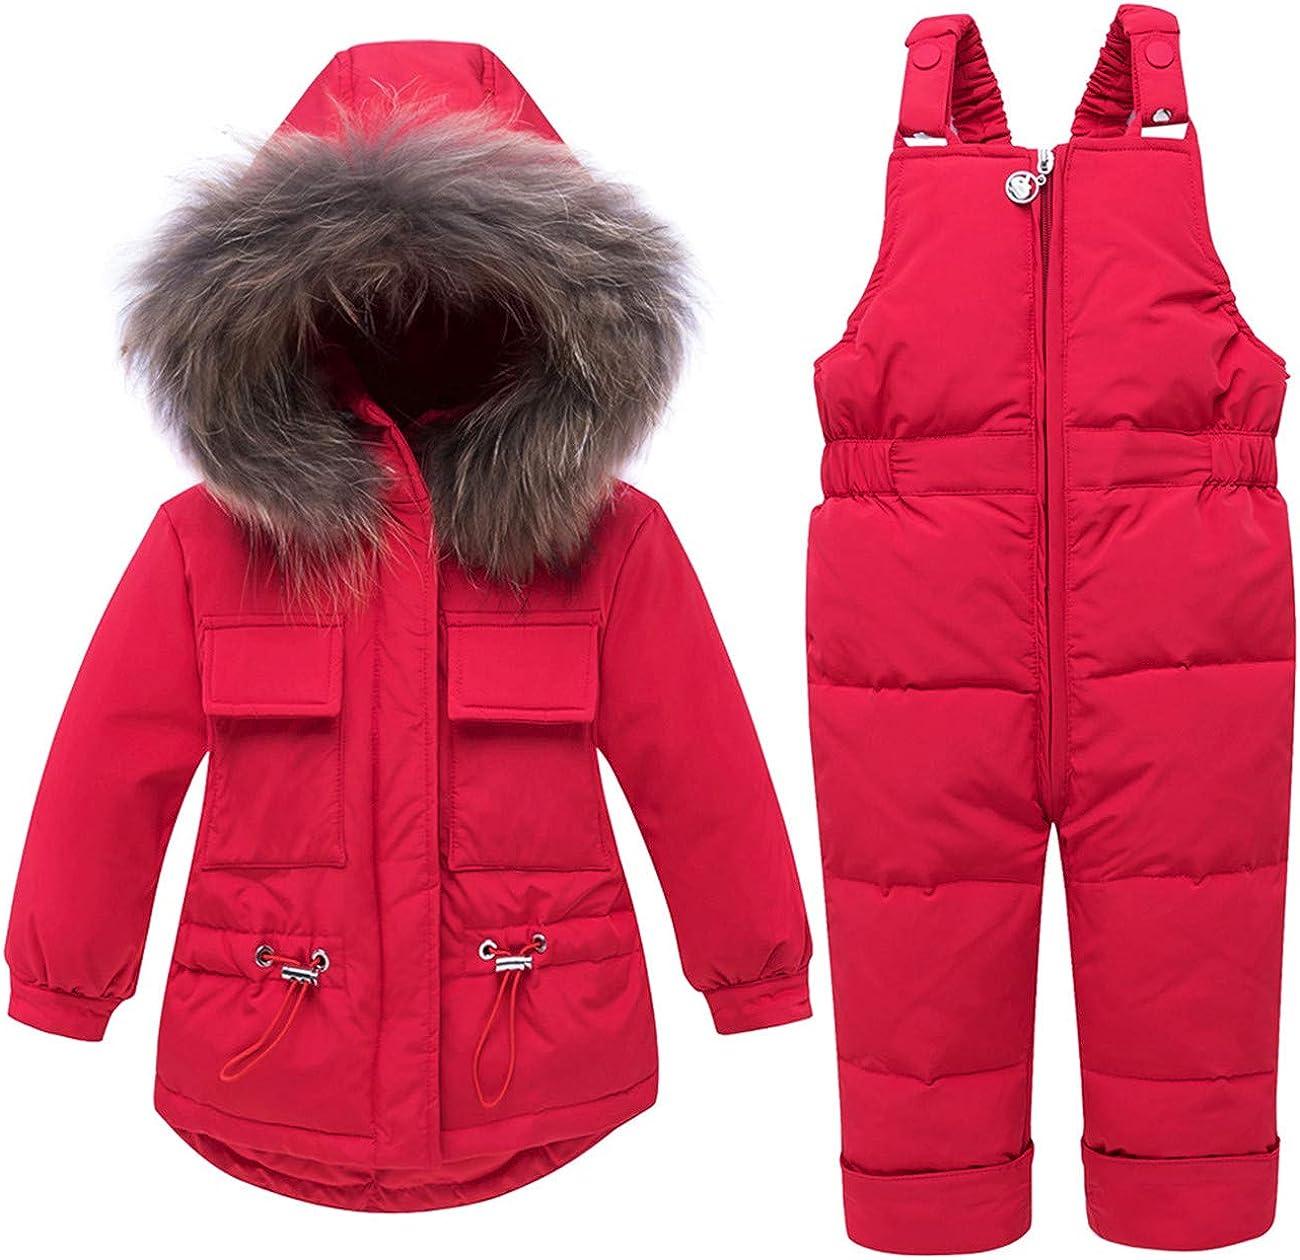 REWANGOING Baby Girls Winter Warm Fur Trim Hooded Zipper Sweety Pocket Puffer Down Jacket Snowsuit with Ski Bib Pants Set